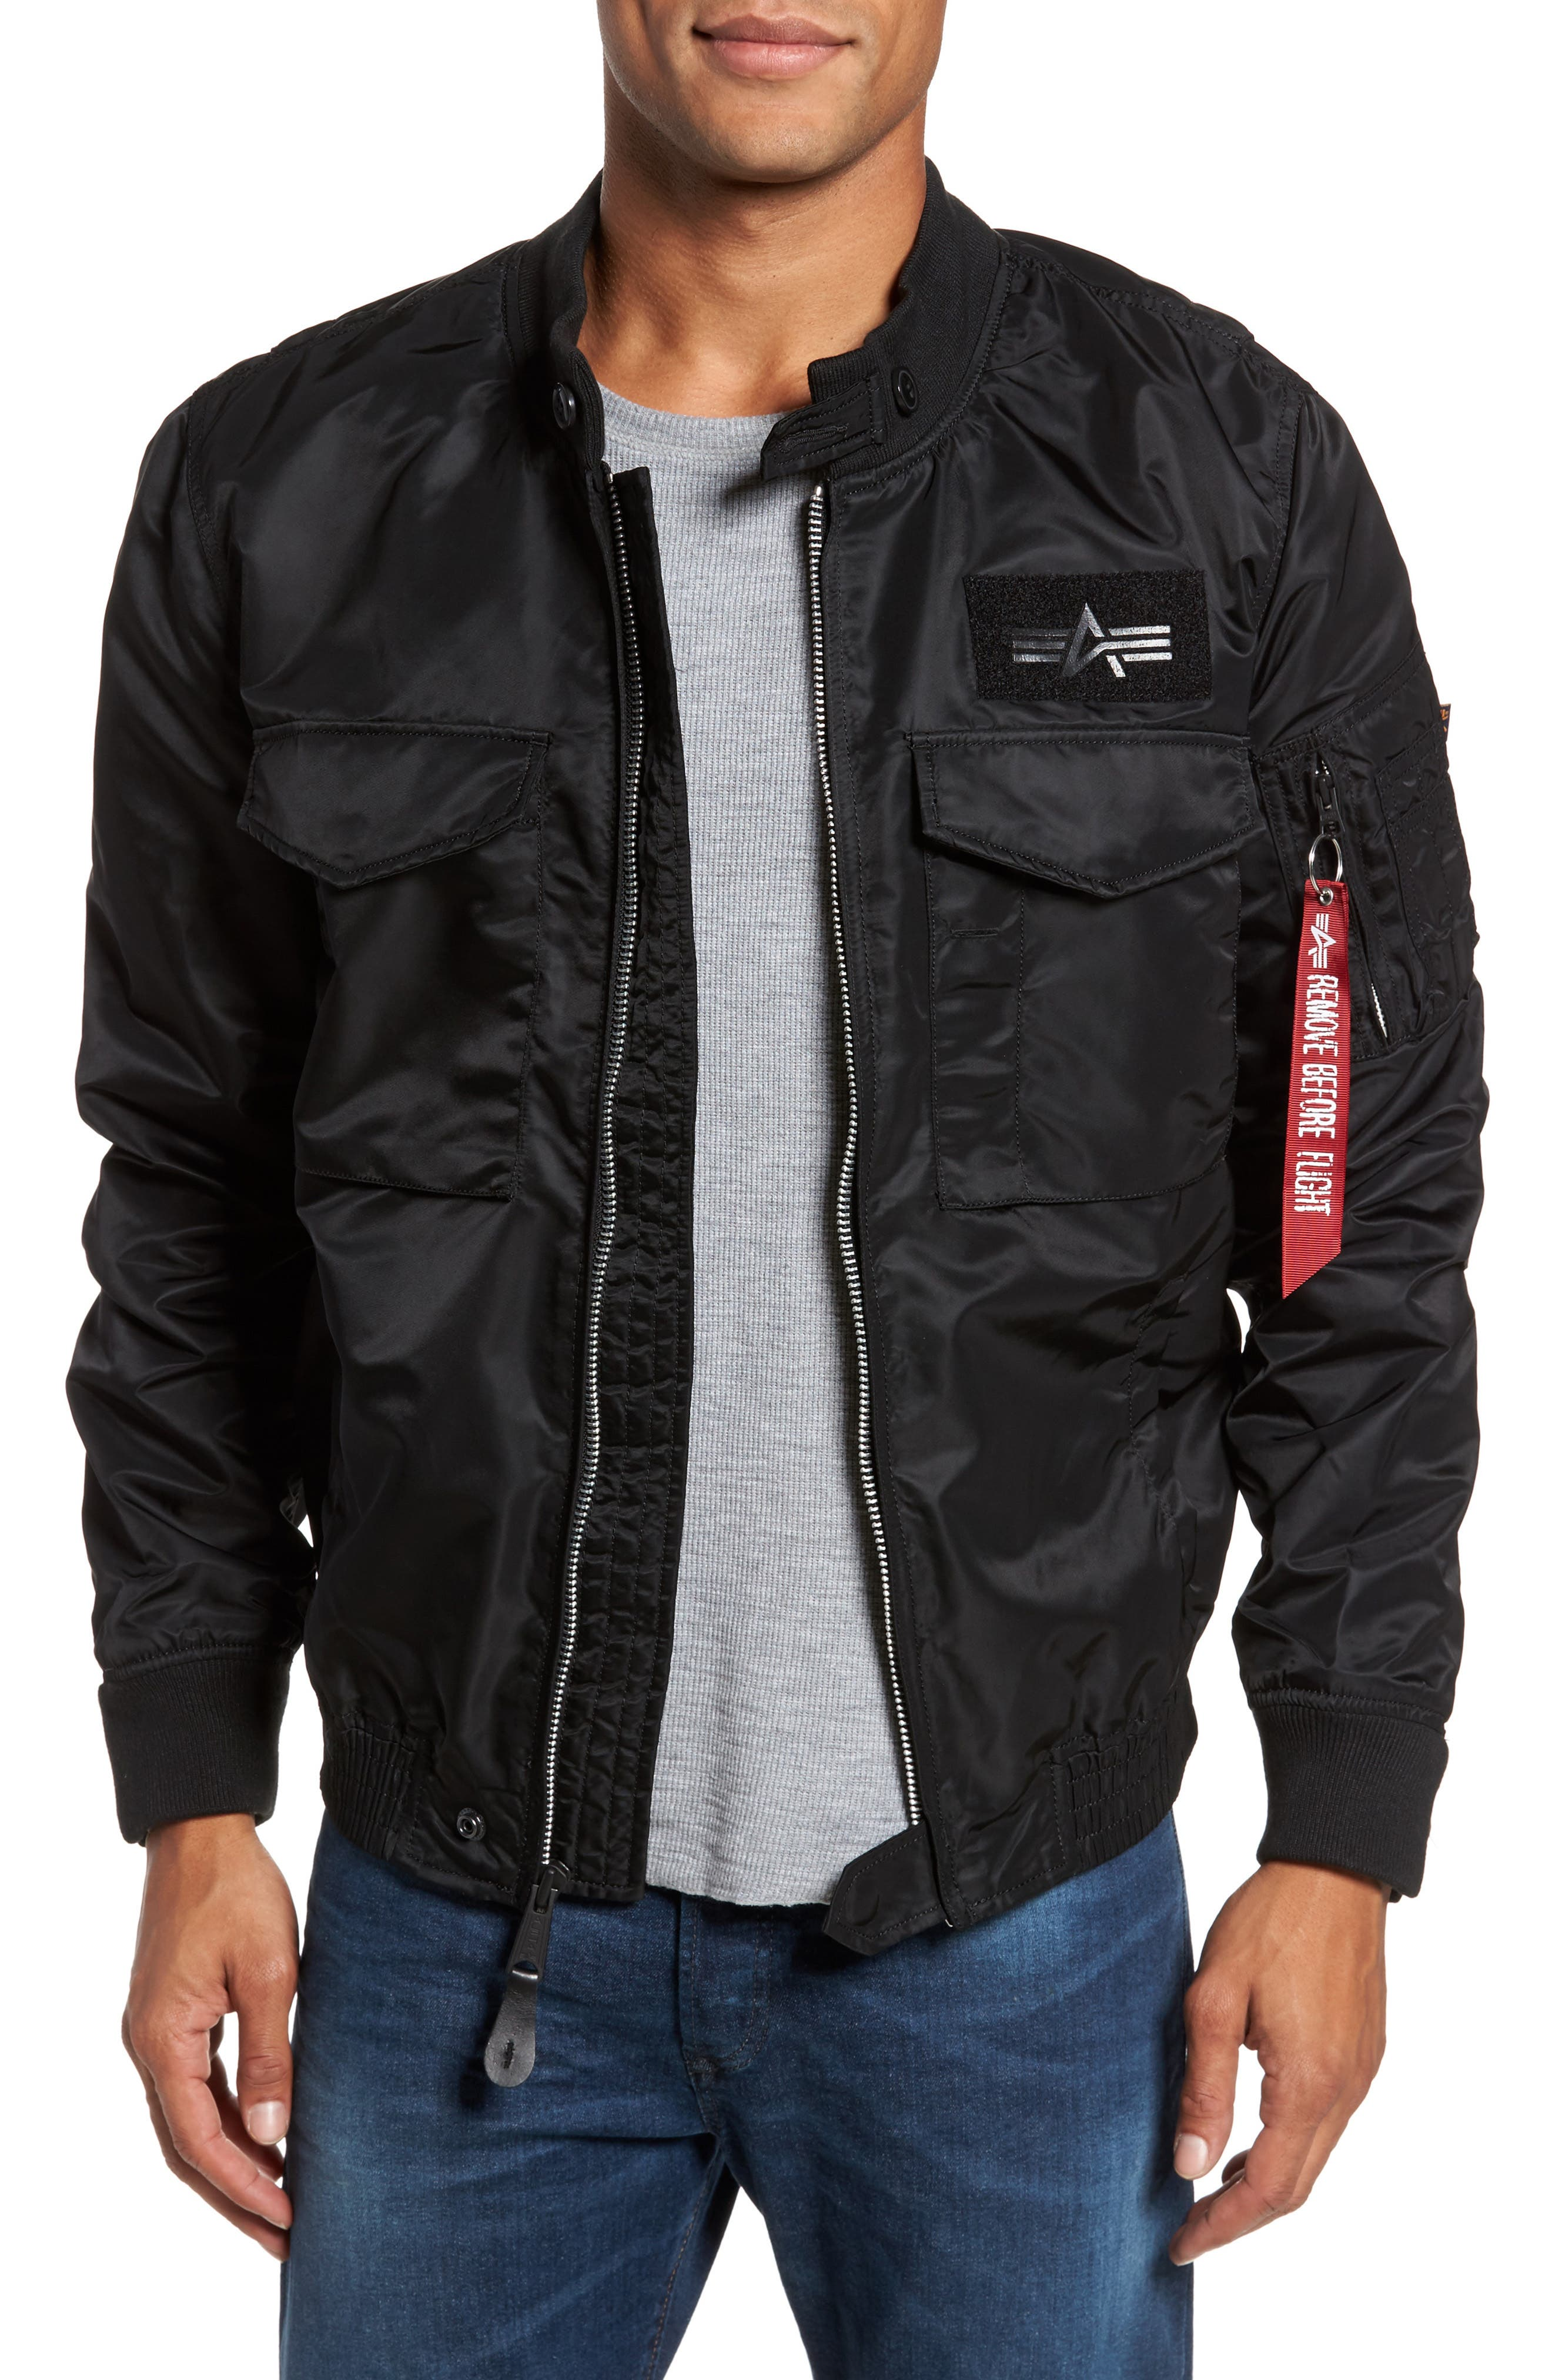 Weps Mod Jacket,                             Main thumbnail 1, color,                             001